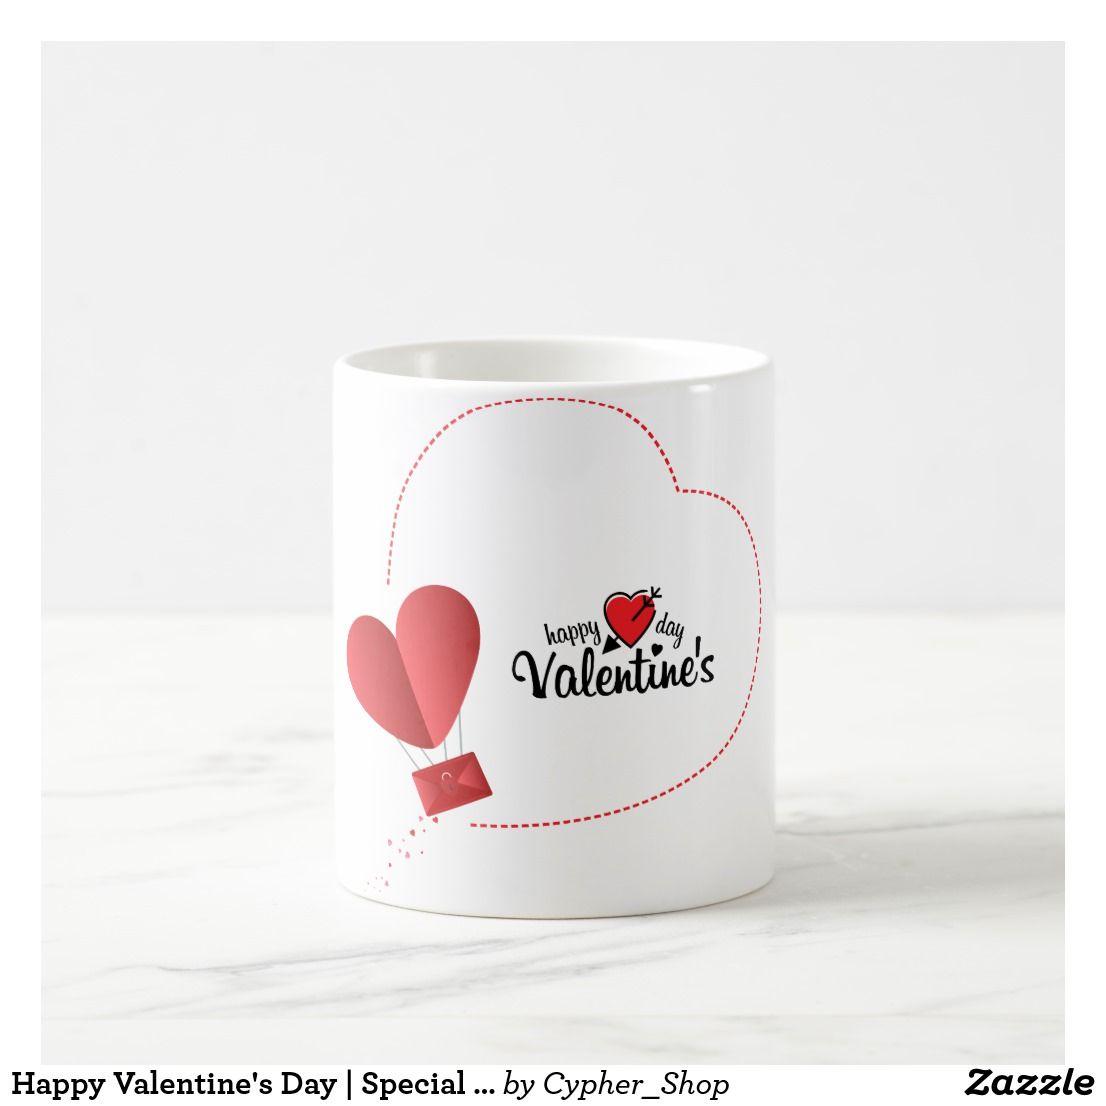 Happy Valentine S Day Special Mug Zazzle Com In 2020 Valentine Day Special Happy Valentines Day Happy Valentine